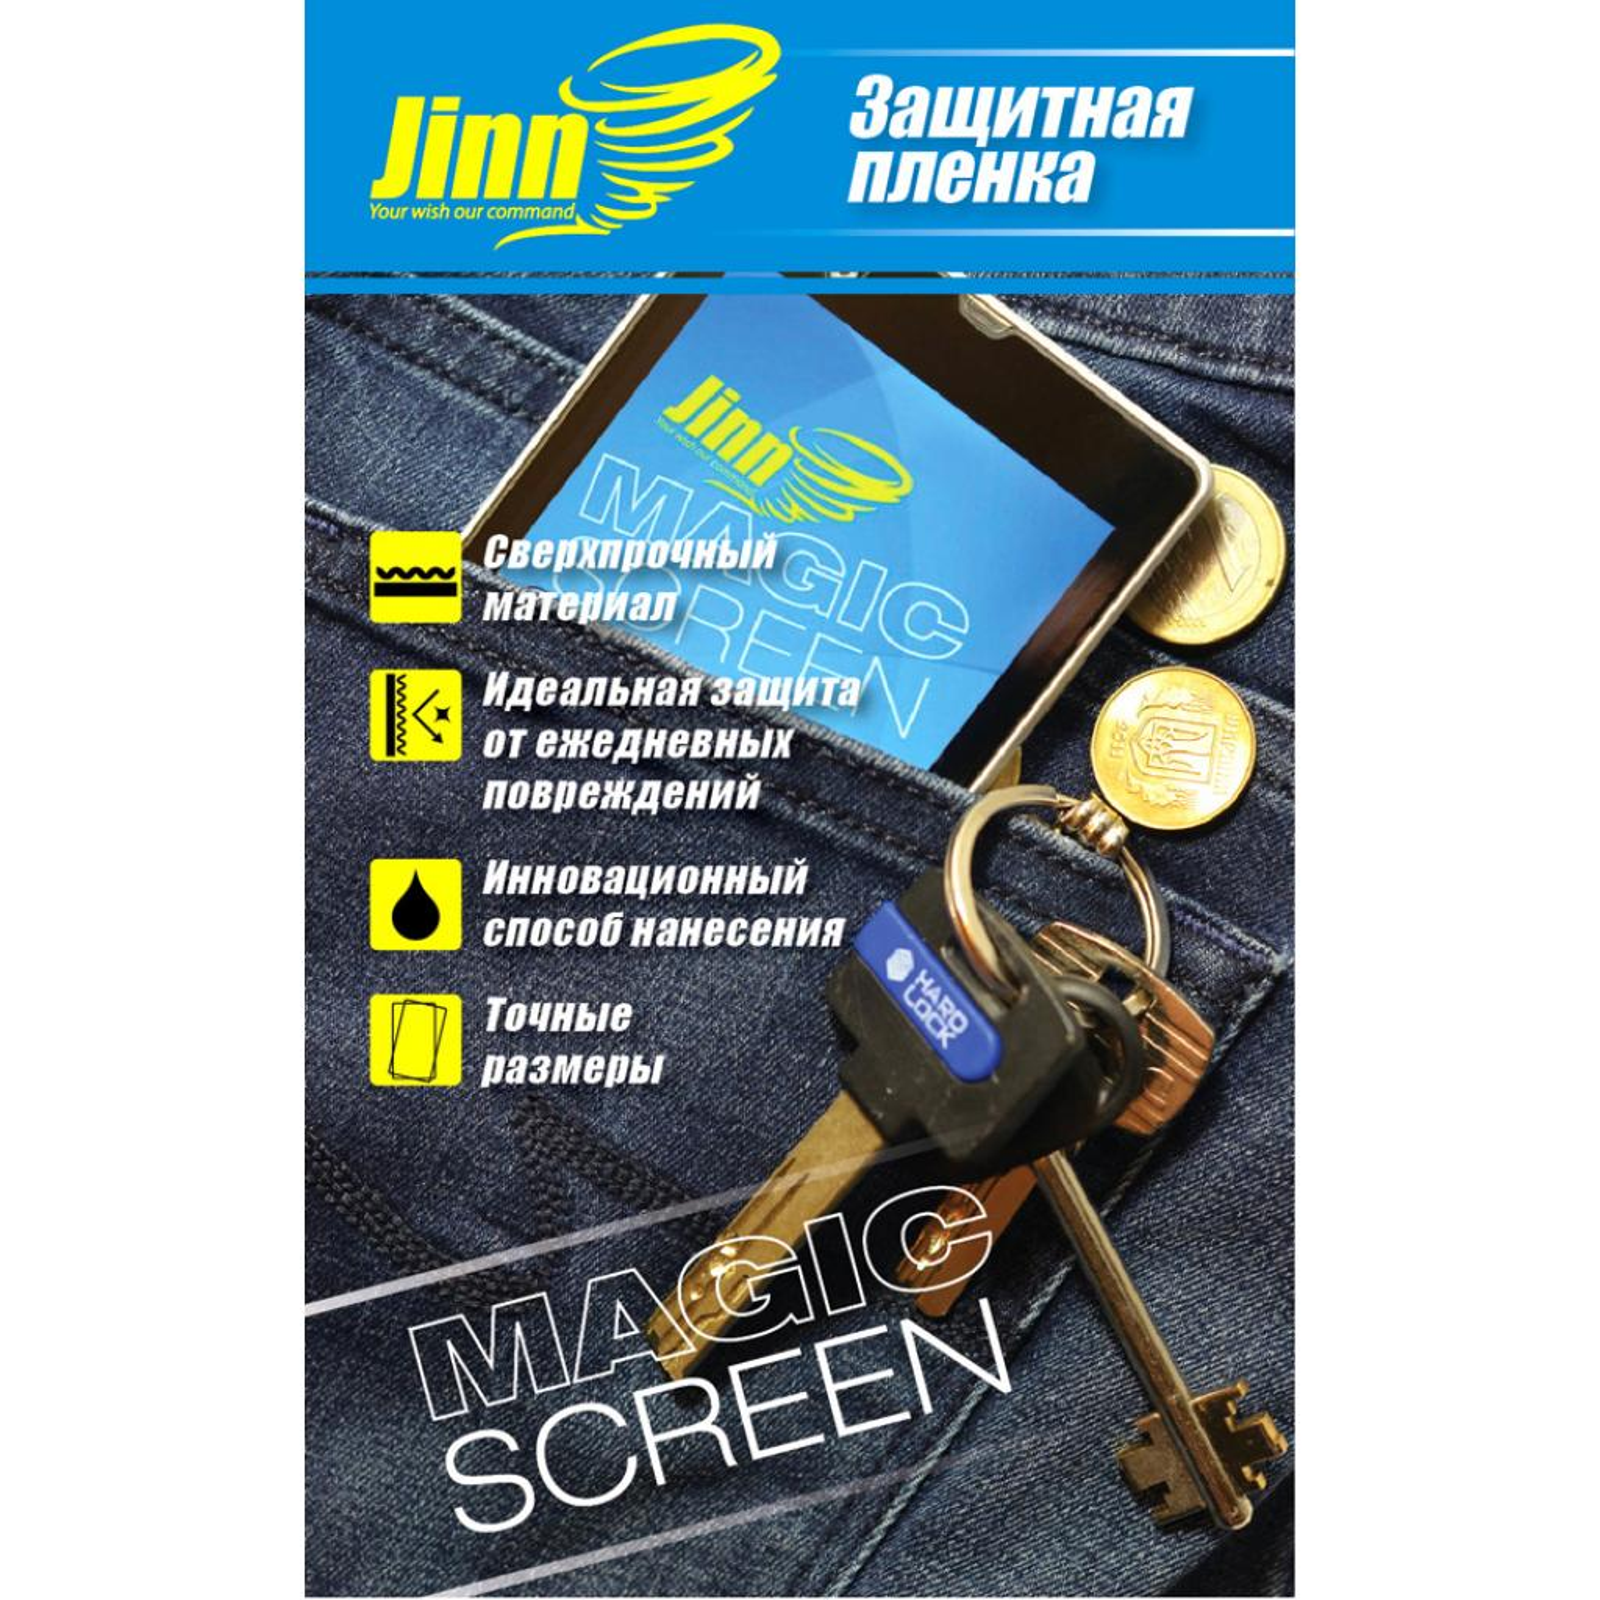 Пленка защитная JINN ультрапрочная Magic Screen для Lenovo IdeaPhone S660 (Lenovo IdeaPhone S660 front)